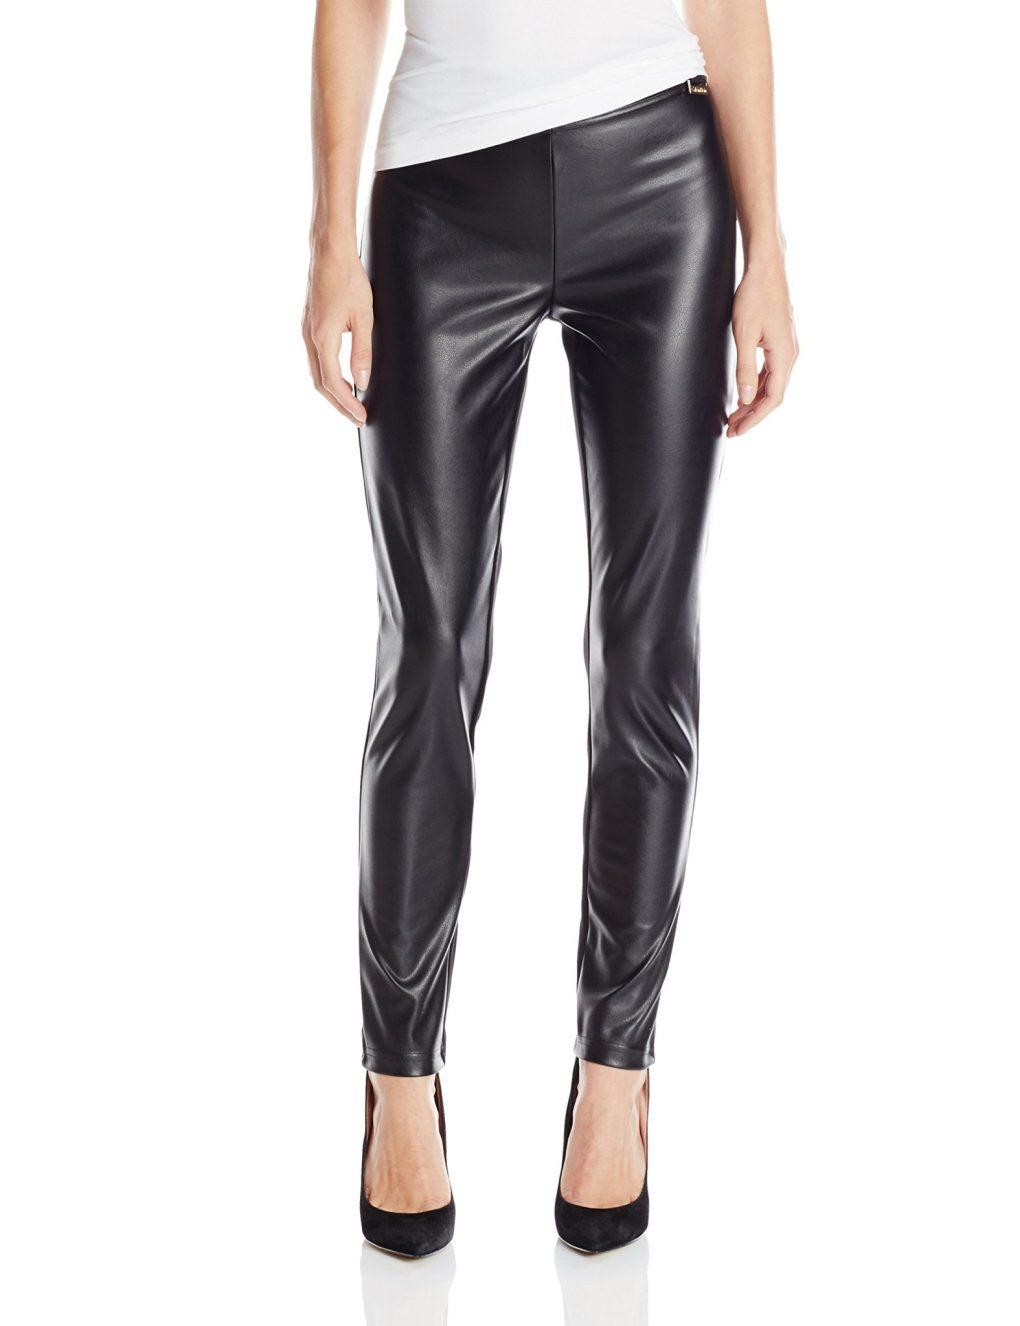 19f5b7092bcc47 Calvin Klein Womens Pleather Front Leggings ...